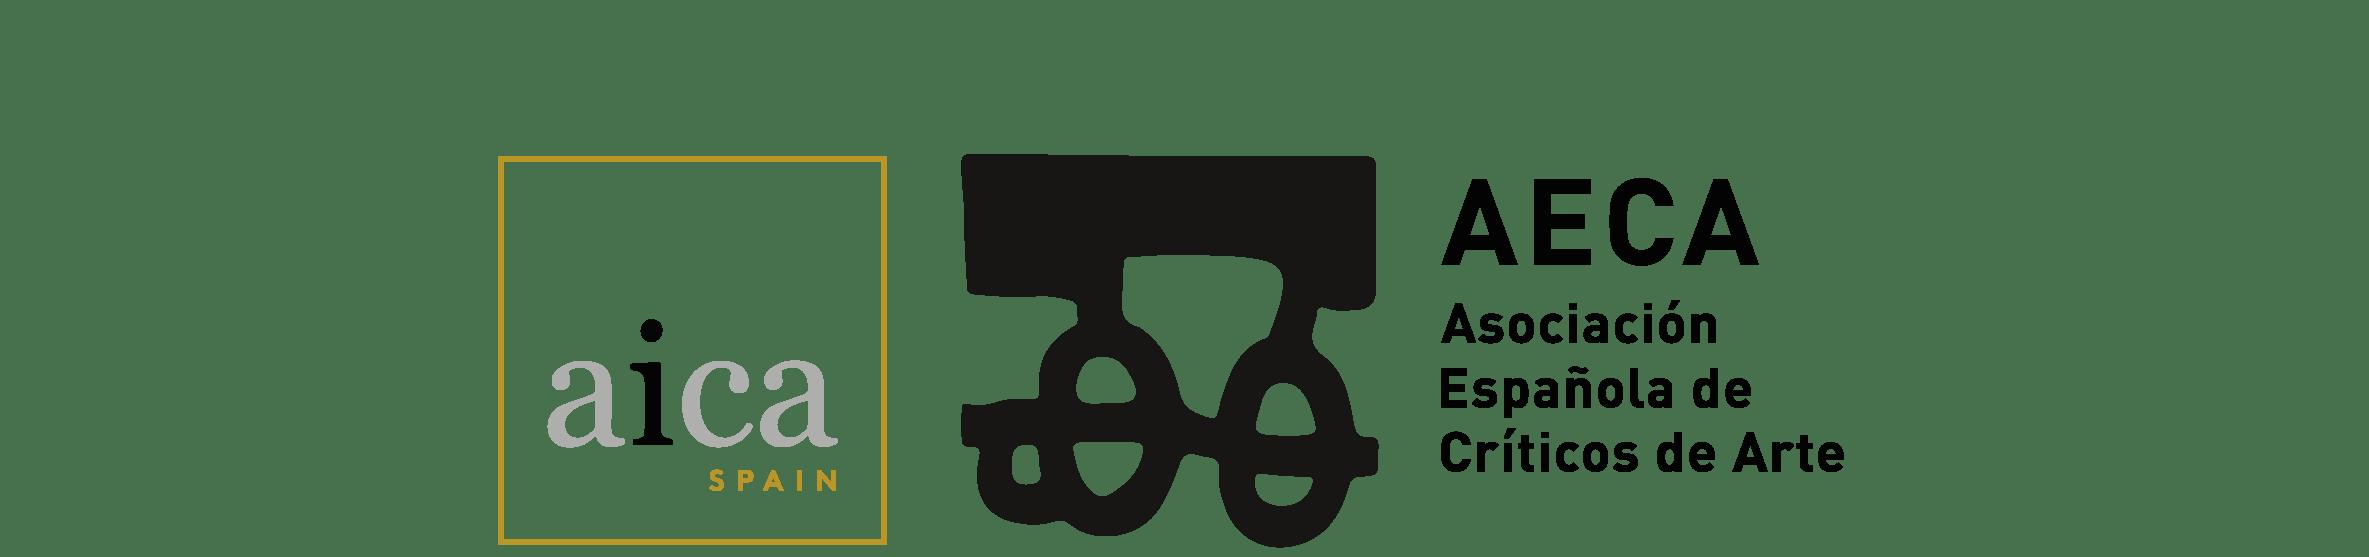 AICA SPAIN / AECA